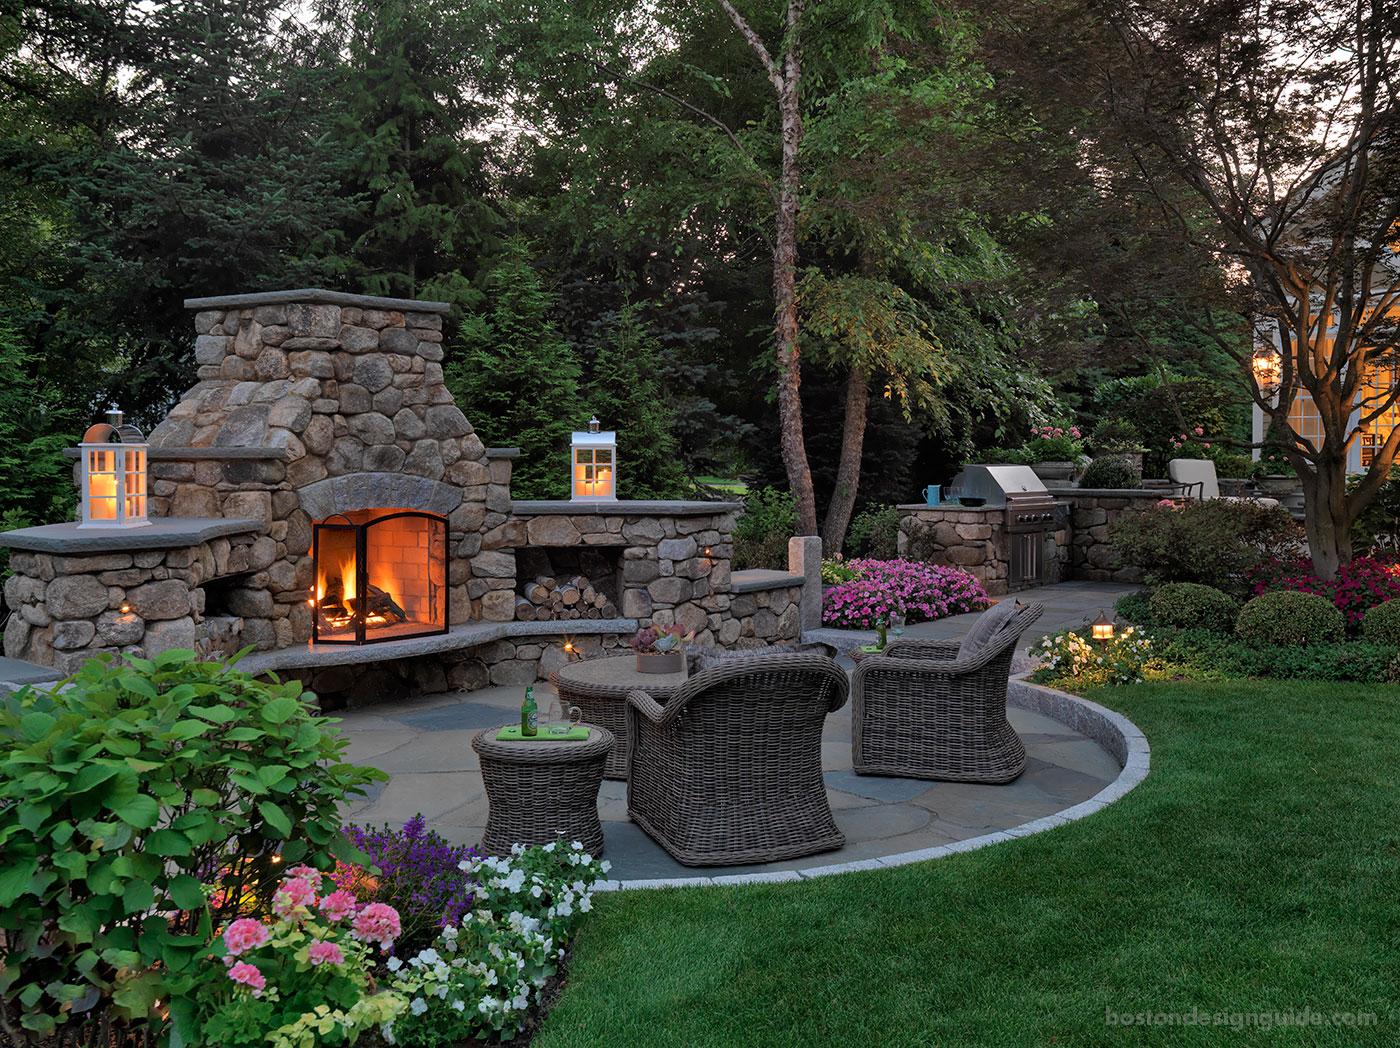 Custom fireplace design by Sudbury Design Group